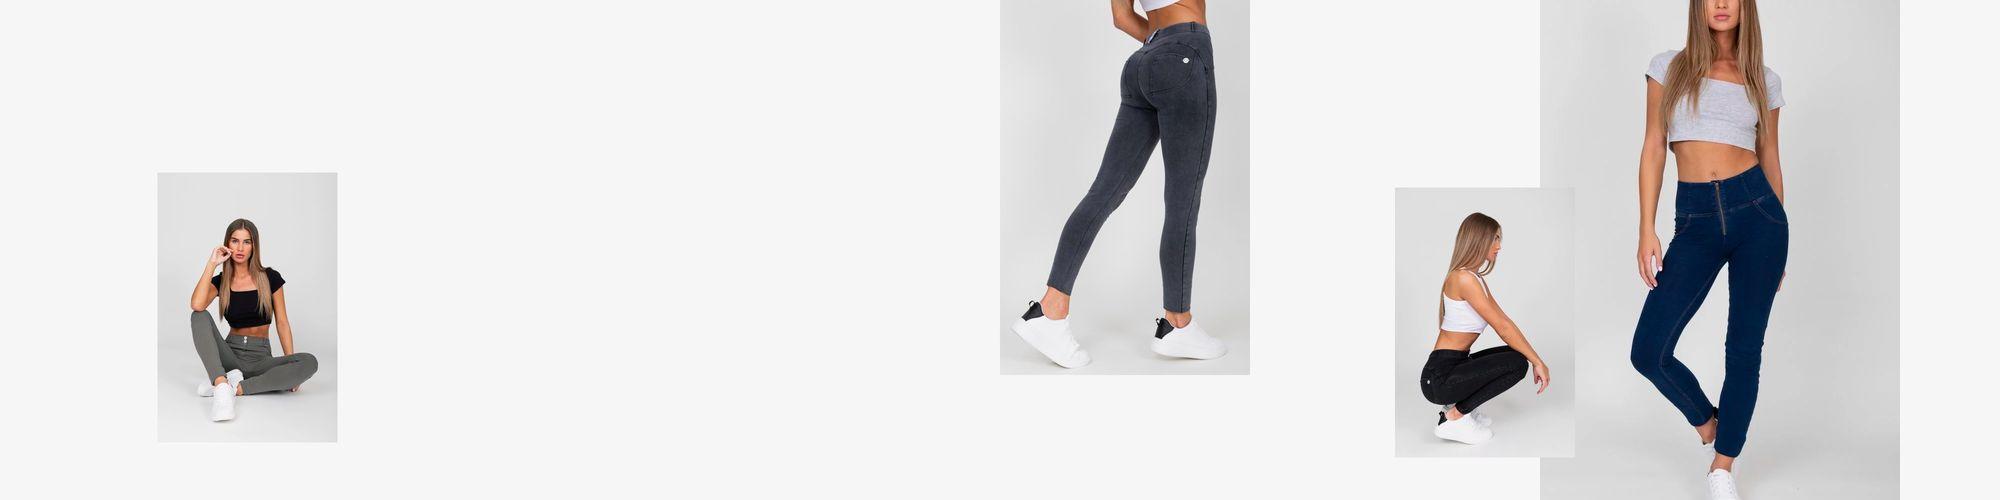 Naskladňujeme Hugz jeans  s push-up efektem!